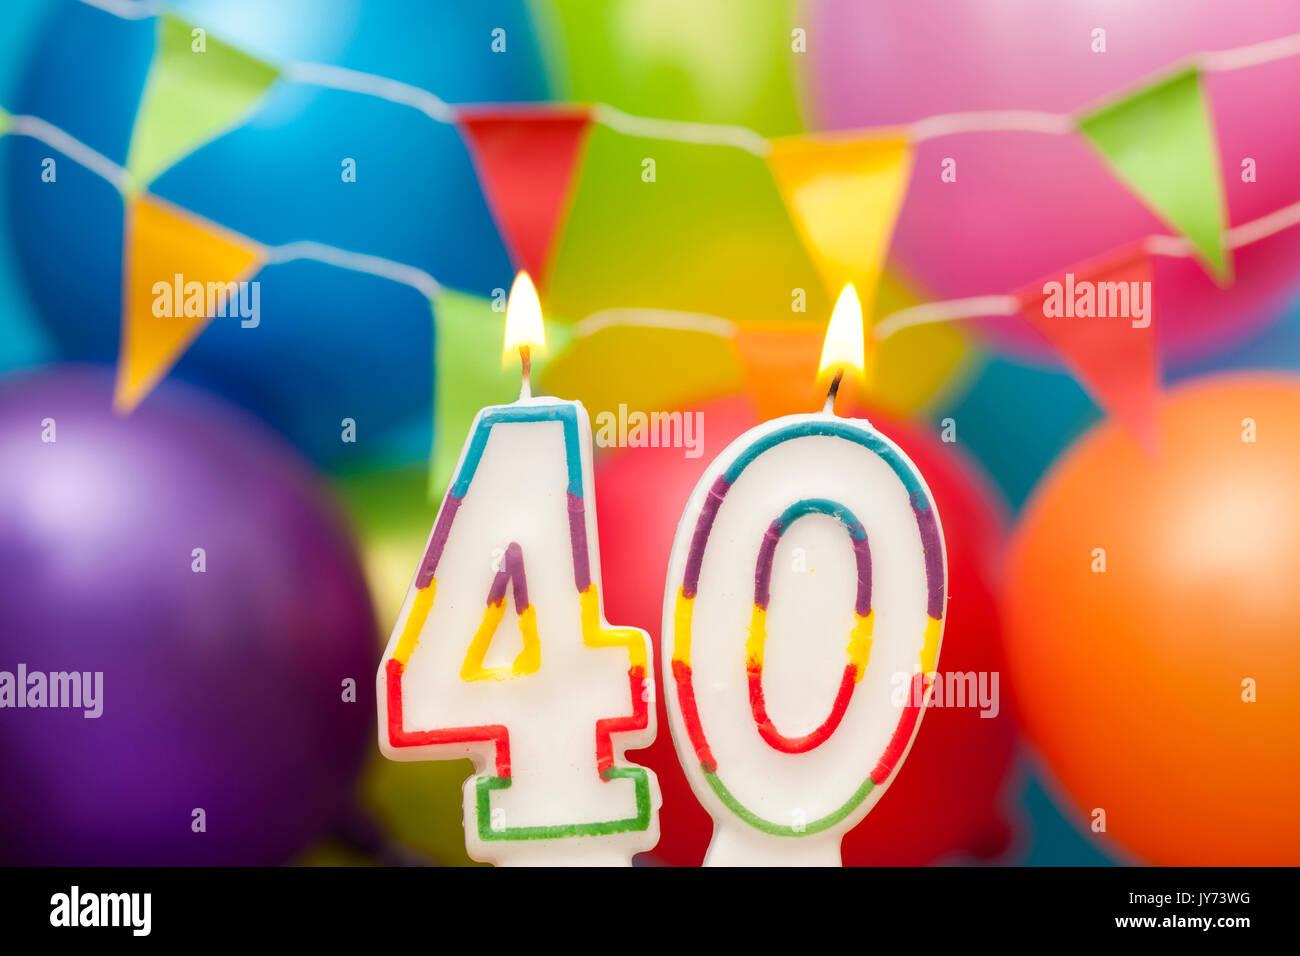 Imagenes De Cumpleanos Numero 40.Feliz Cumpleanos Numero 40 Velas De Celebracion Con